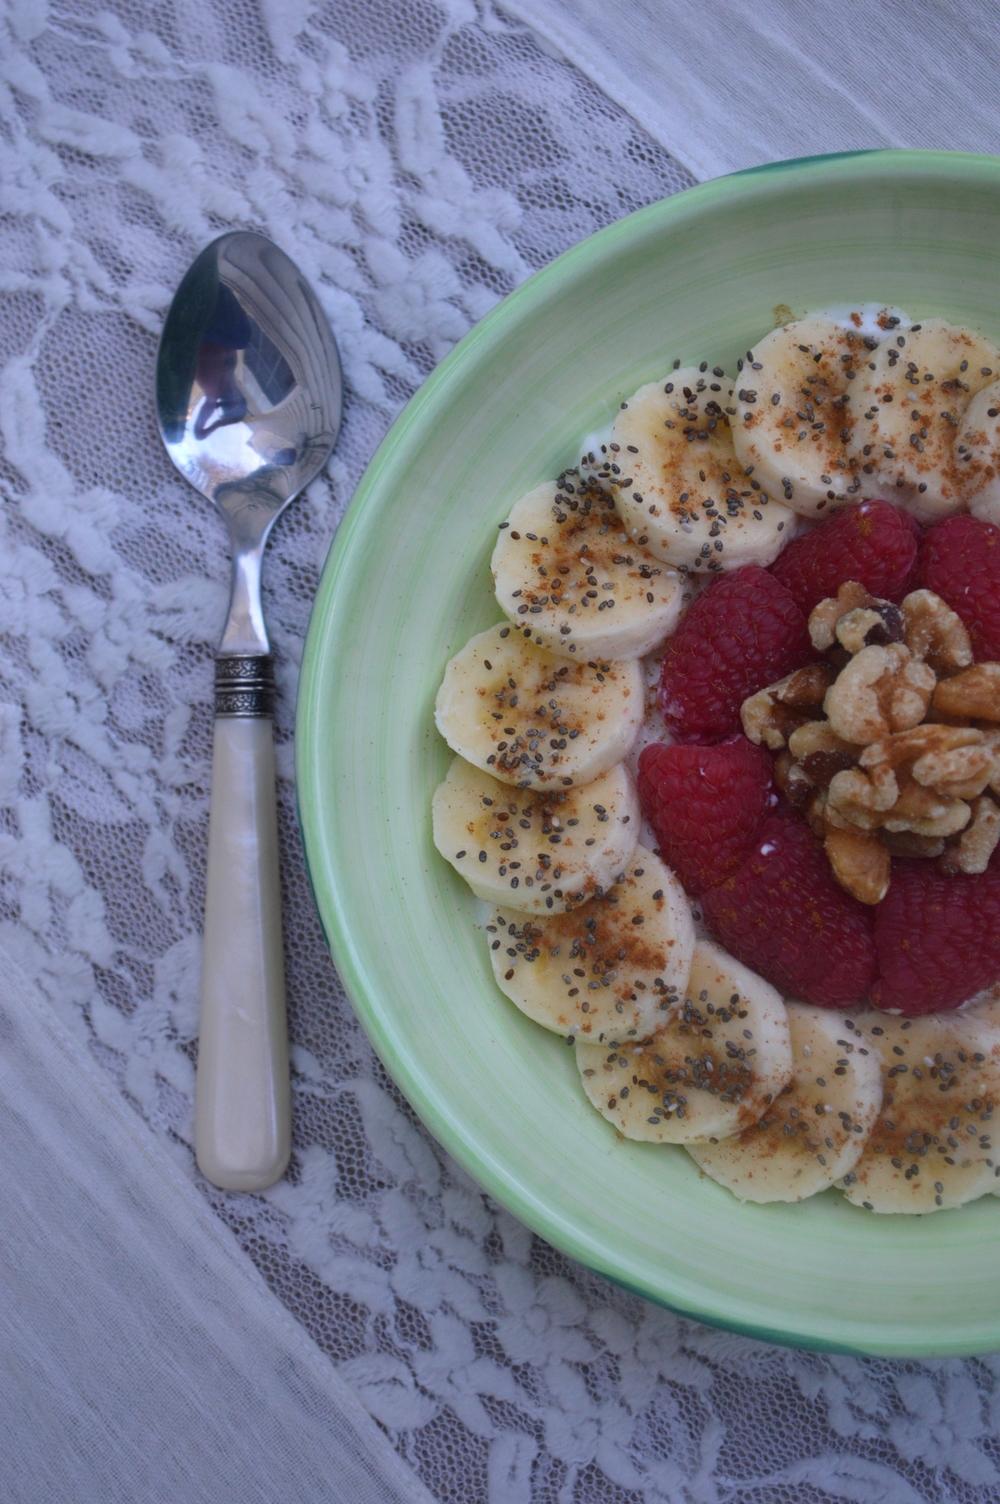 LaurenSchwaiger-Blog-Fruit&Superfood-Bowl.jpg